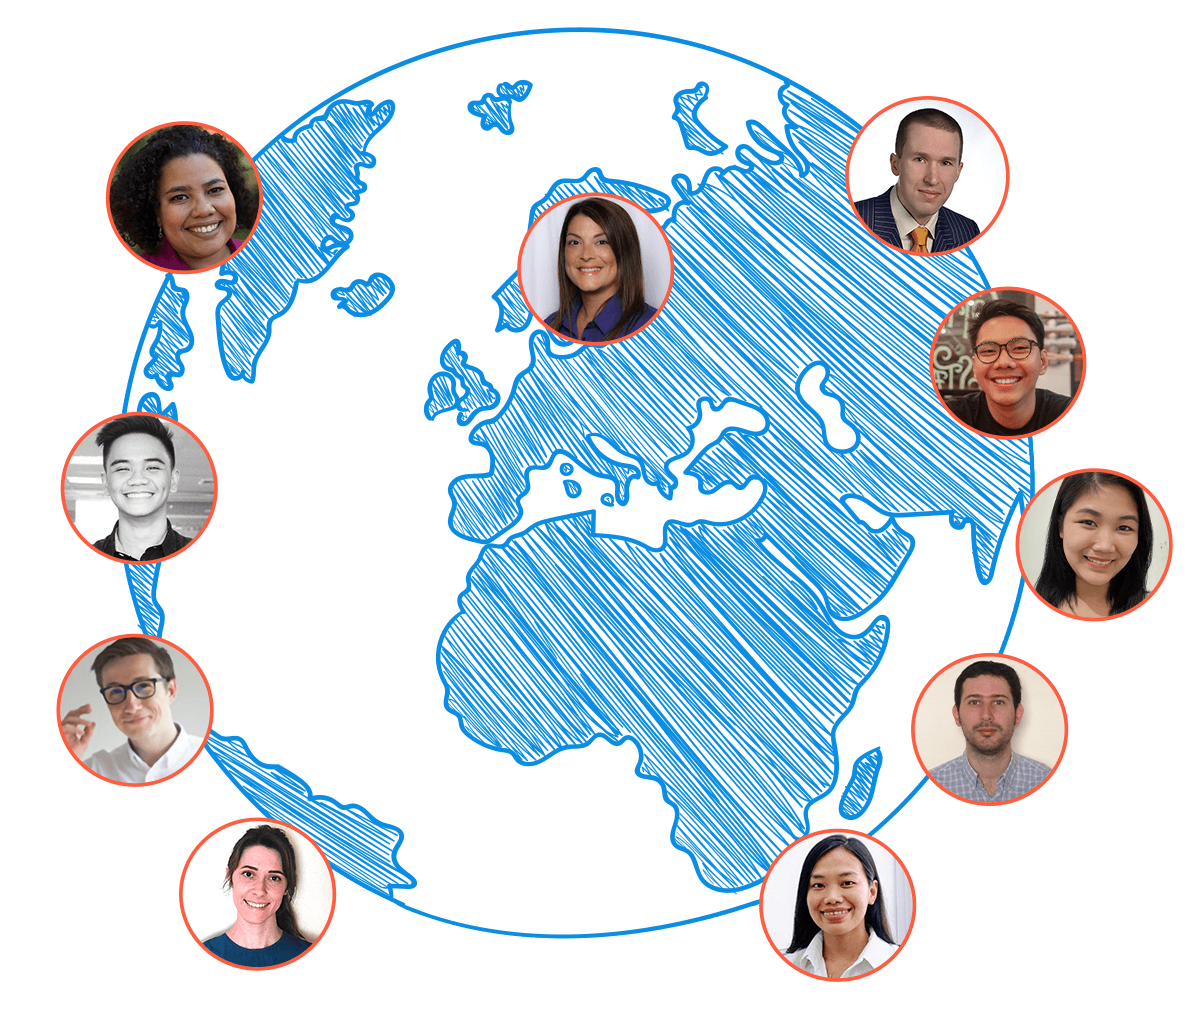 Team around the globe